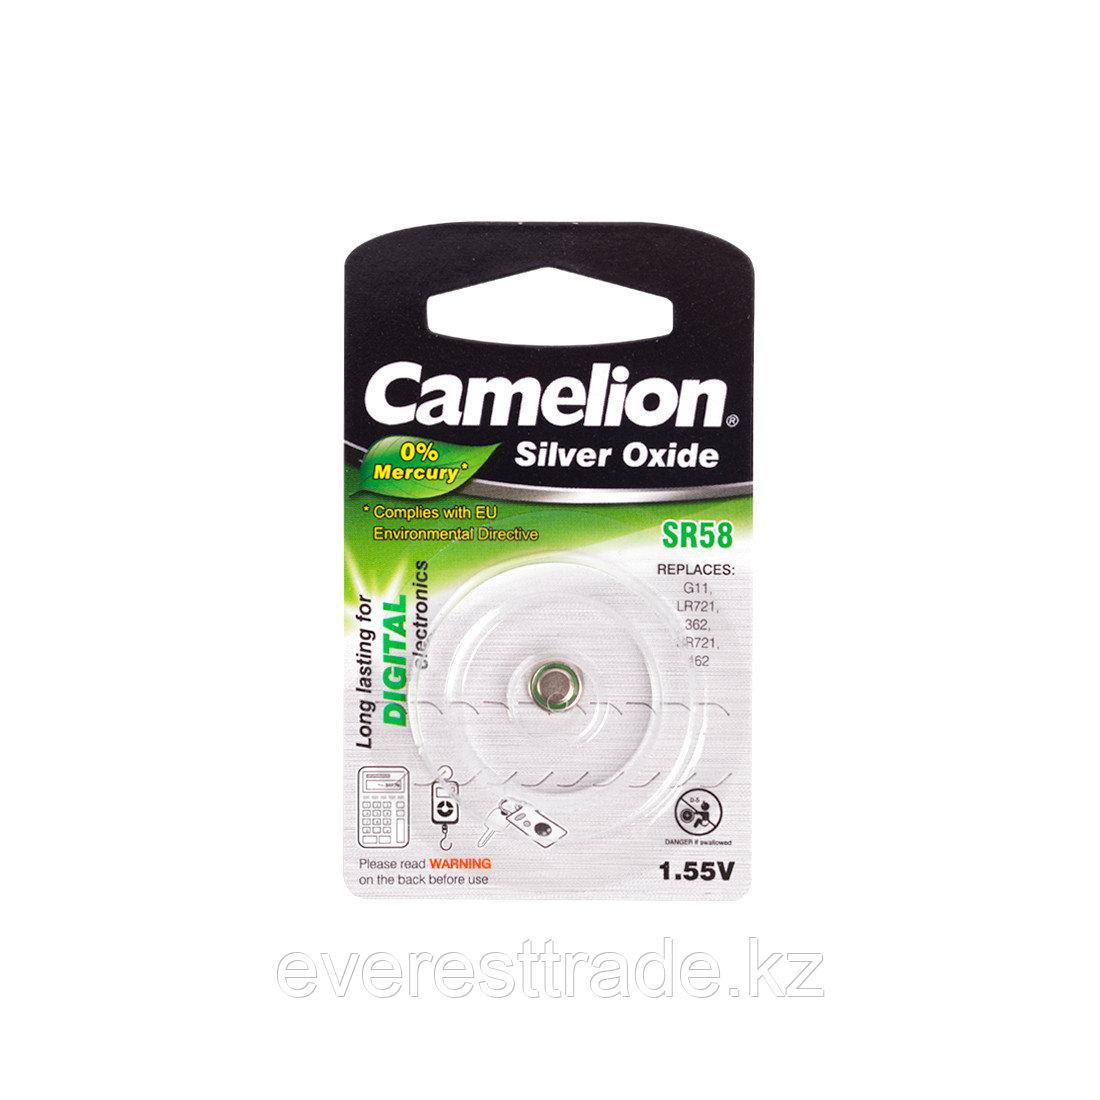 Camelion Батарейки, CAMELION, SR58-BP1 , Silver Oxide, 1.55V, 0% Ртути, 1 шт., Блистер